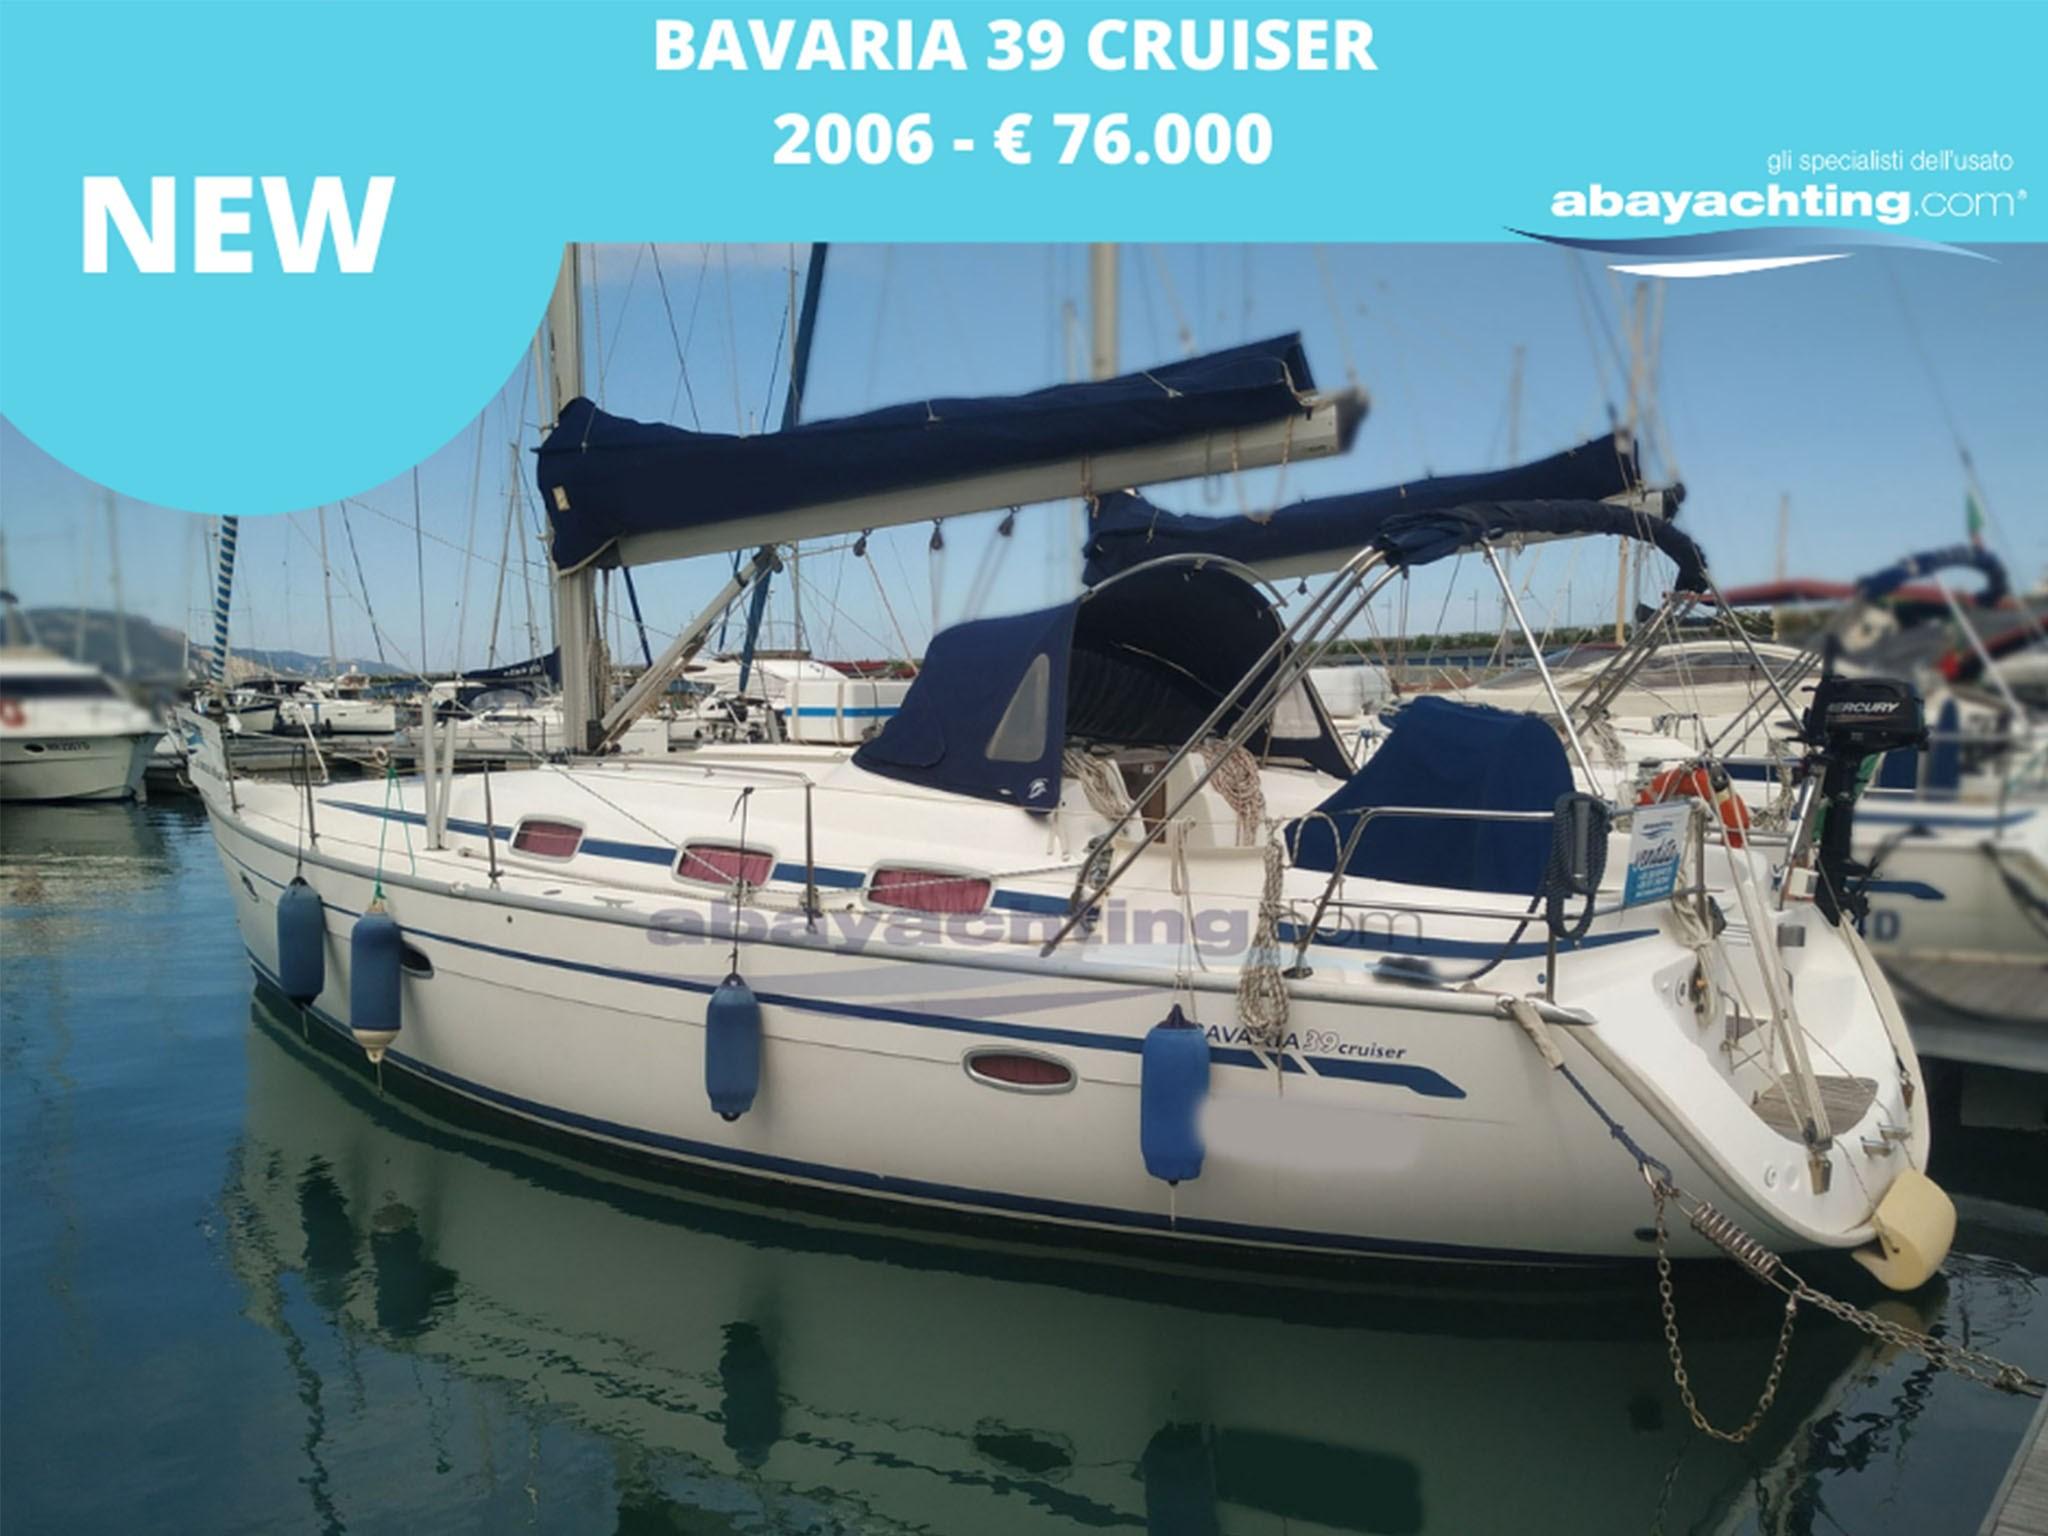 Nuovo arrivo Bavaria 39 Cruiser